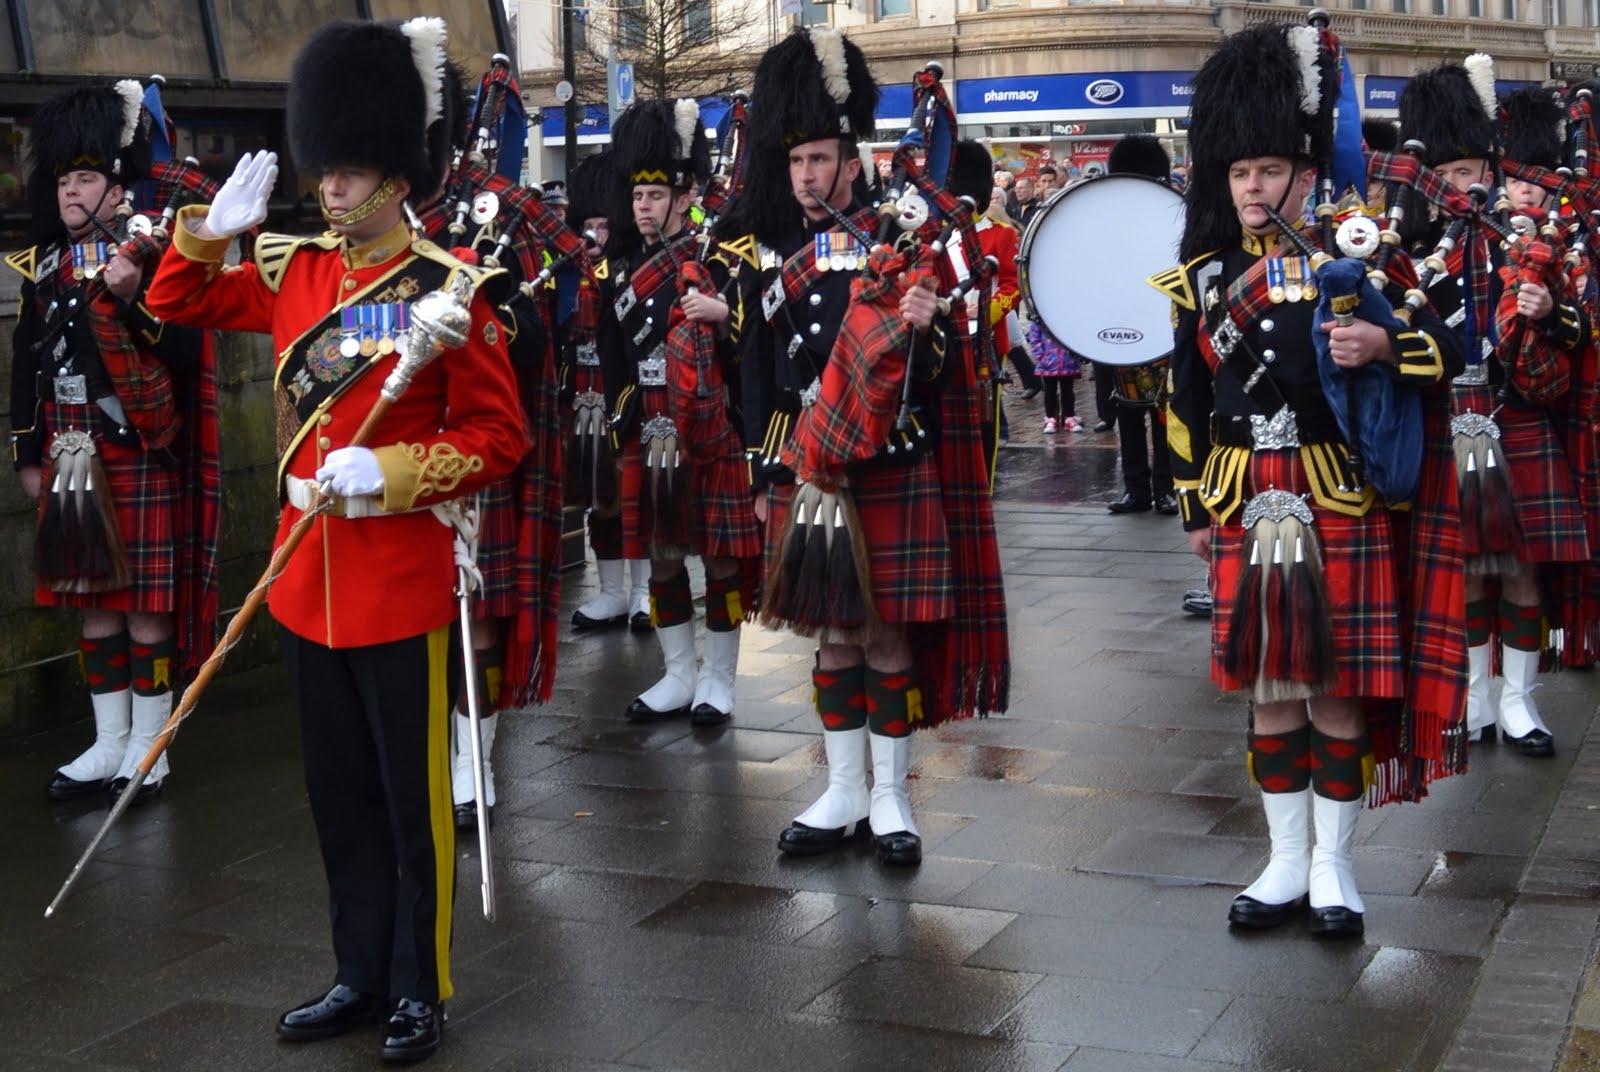 http://1.bp.blogspot.com/-IK4dJKF6mcM/TtUtXEeJPcI/AAAAAAAAr0o/SBkZDaytA70/s1600/Tour+Scotland+Photograph+Royal+Scots+Dragoon+Guards+Pipe+Band+City+Square+Dundee+Scotland+November+29th+04.jpg